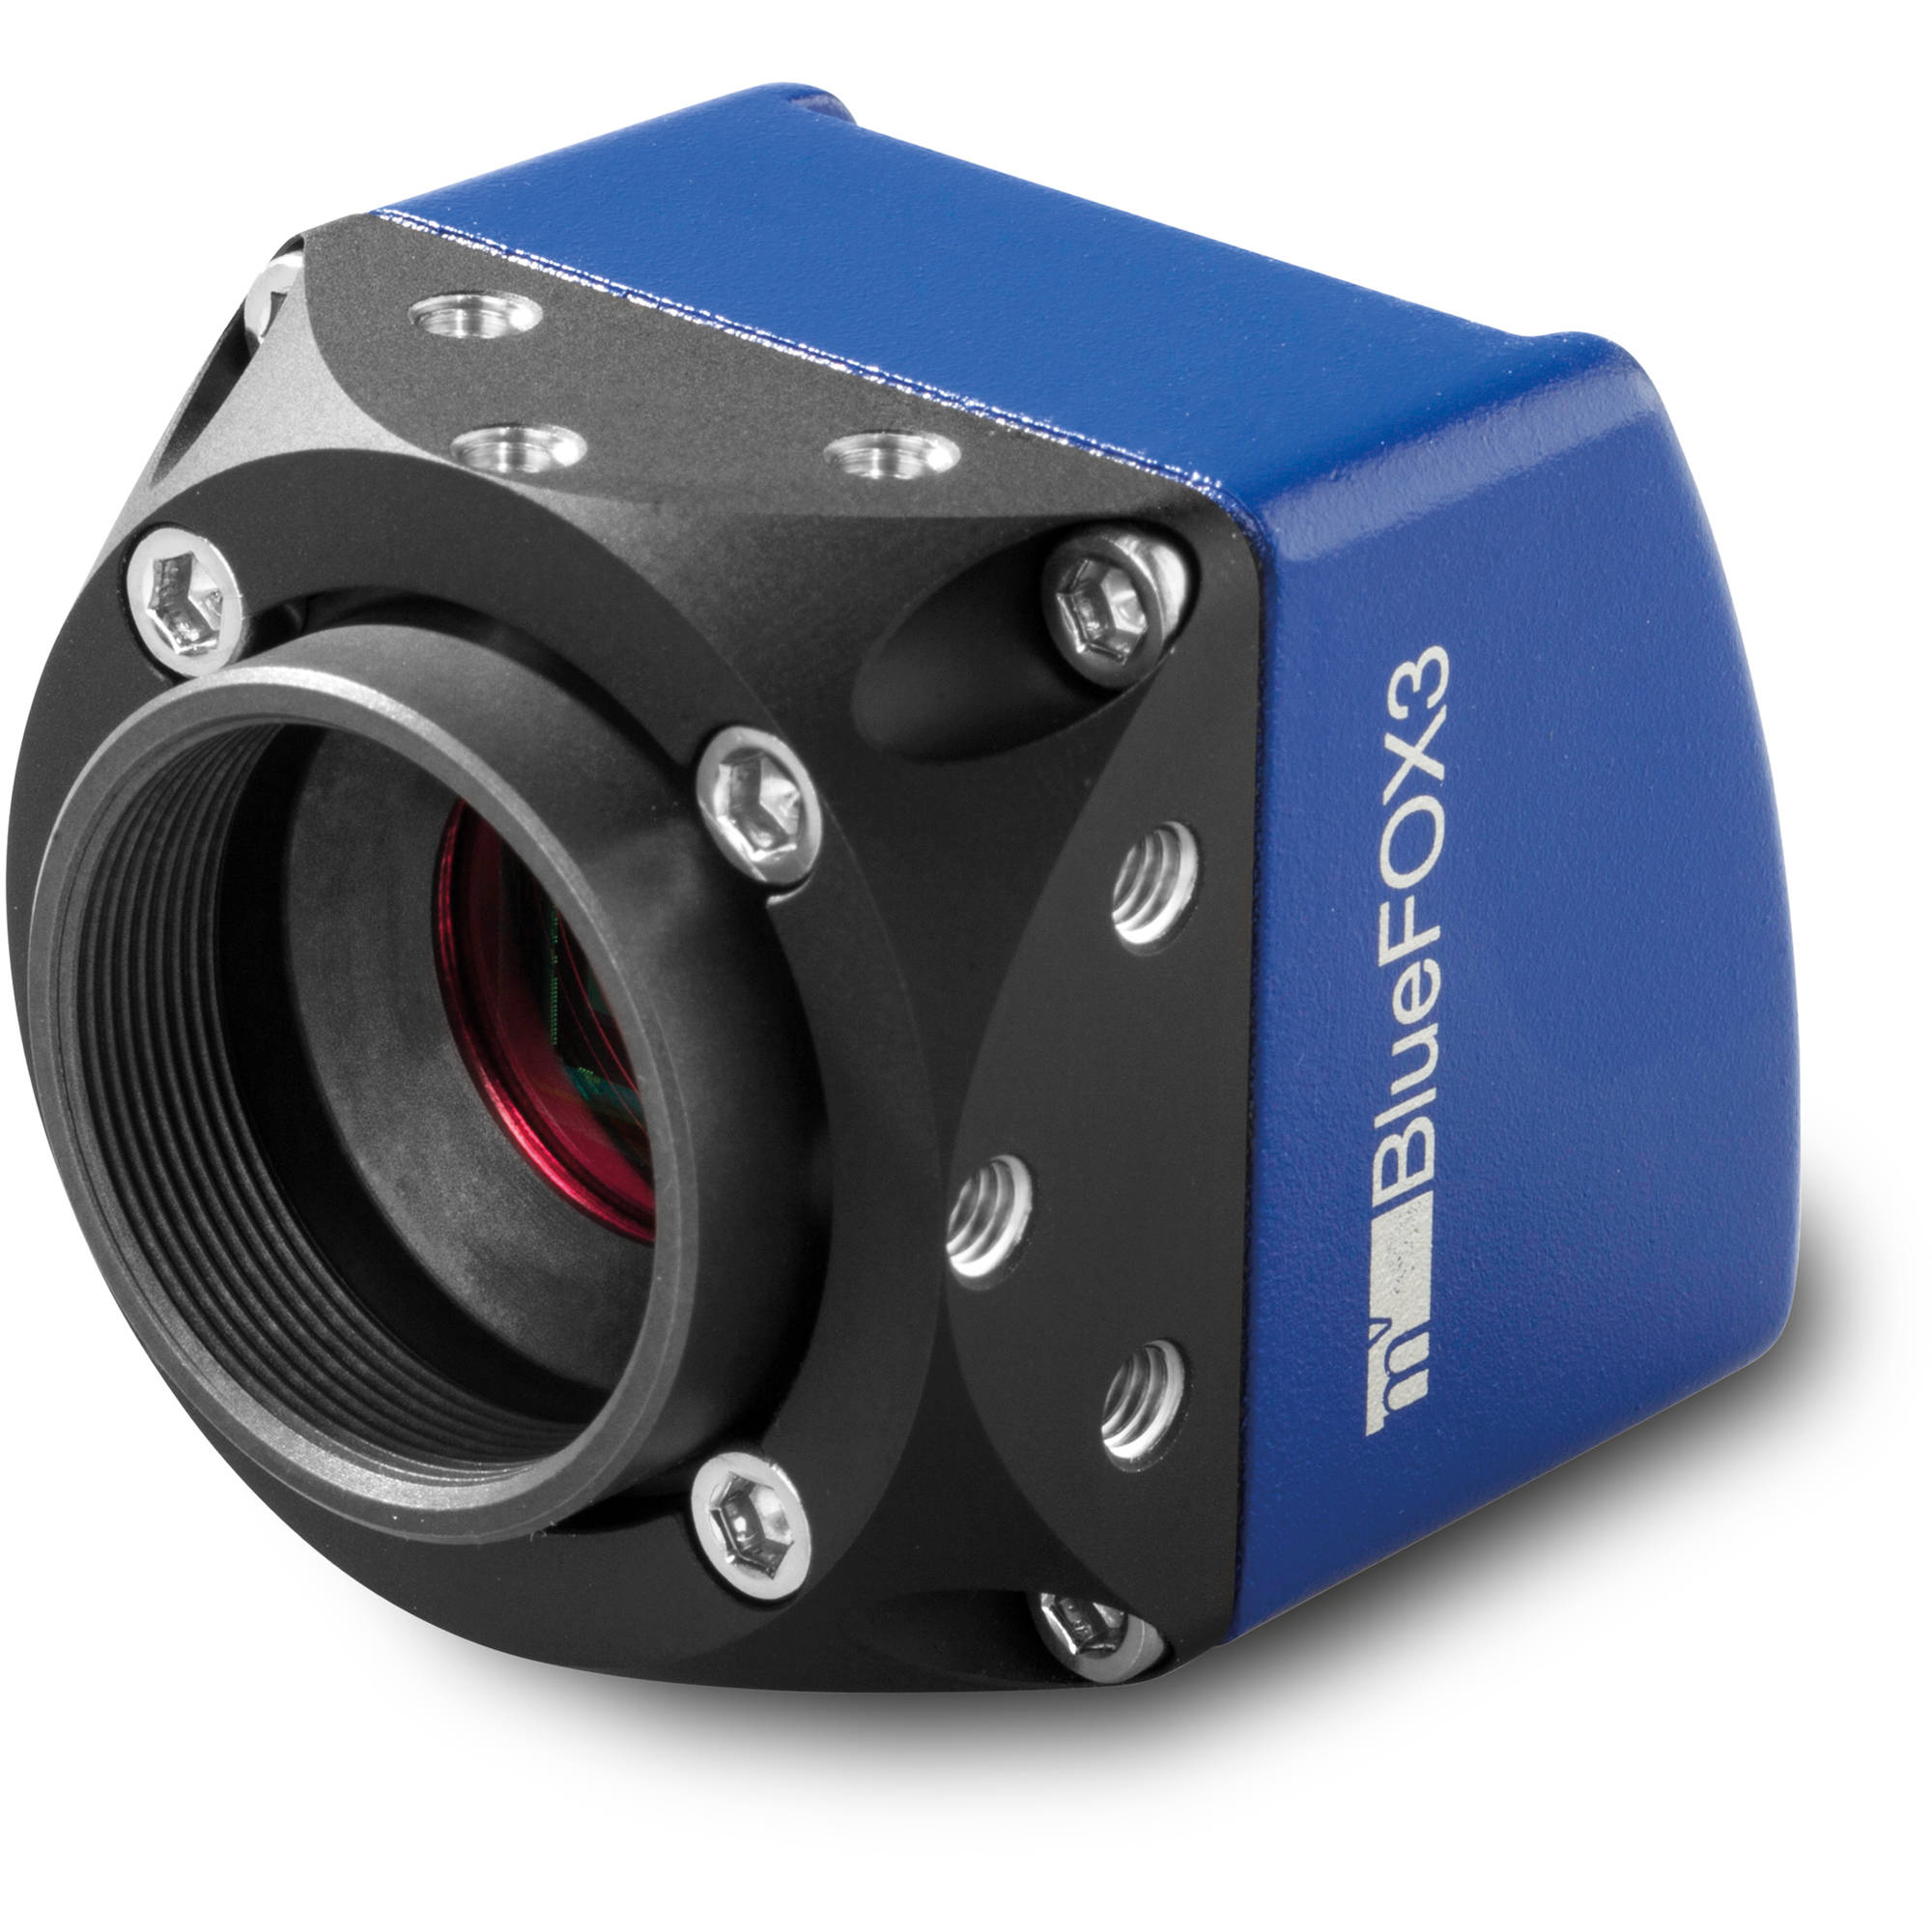 MATRIX VISION BlueFox3 USB3 Vision Camera (12 4MP, 23 4 Hz, Color)